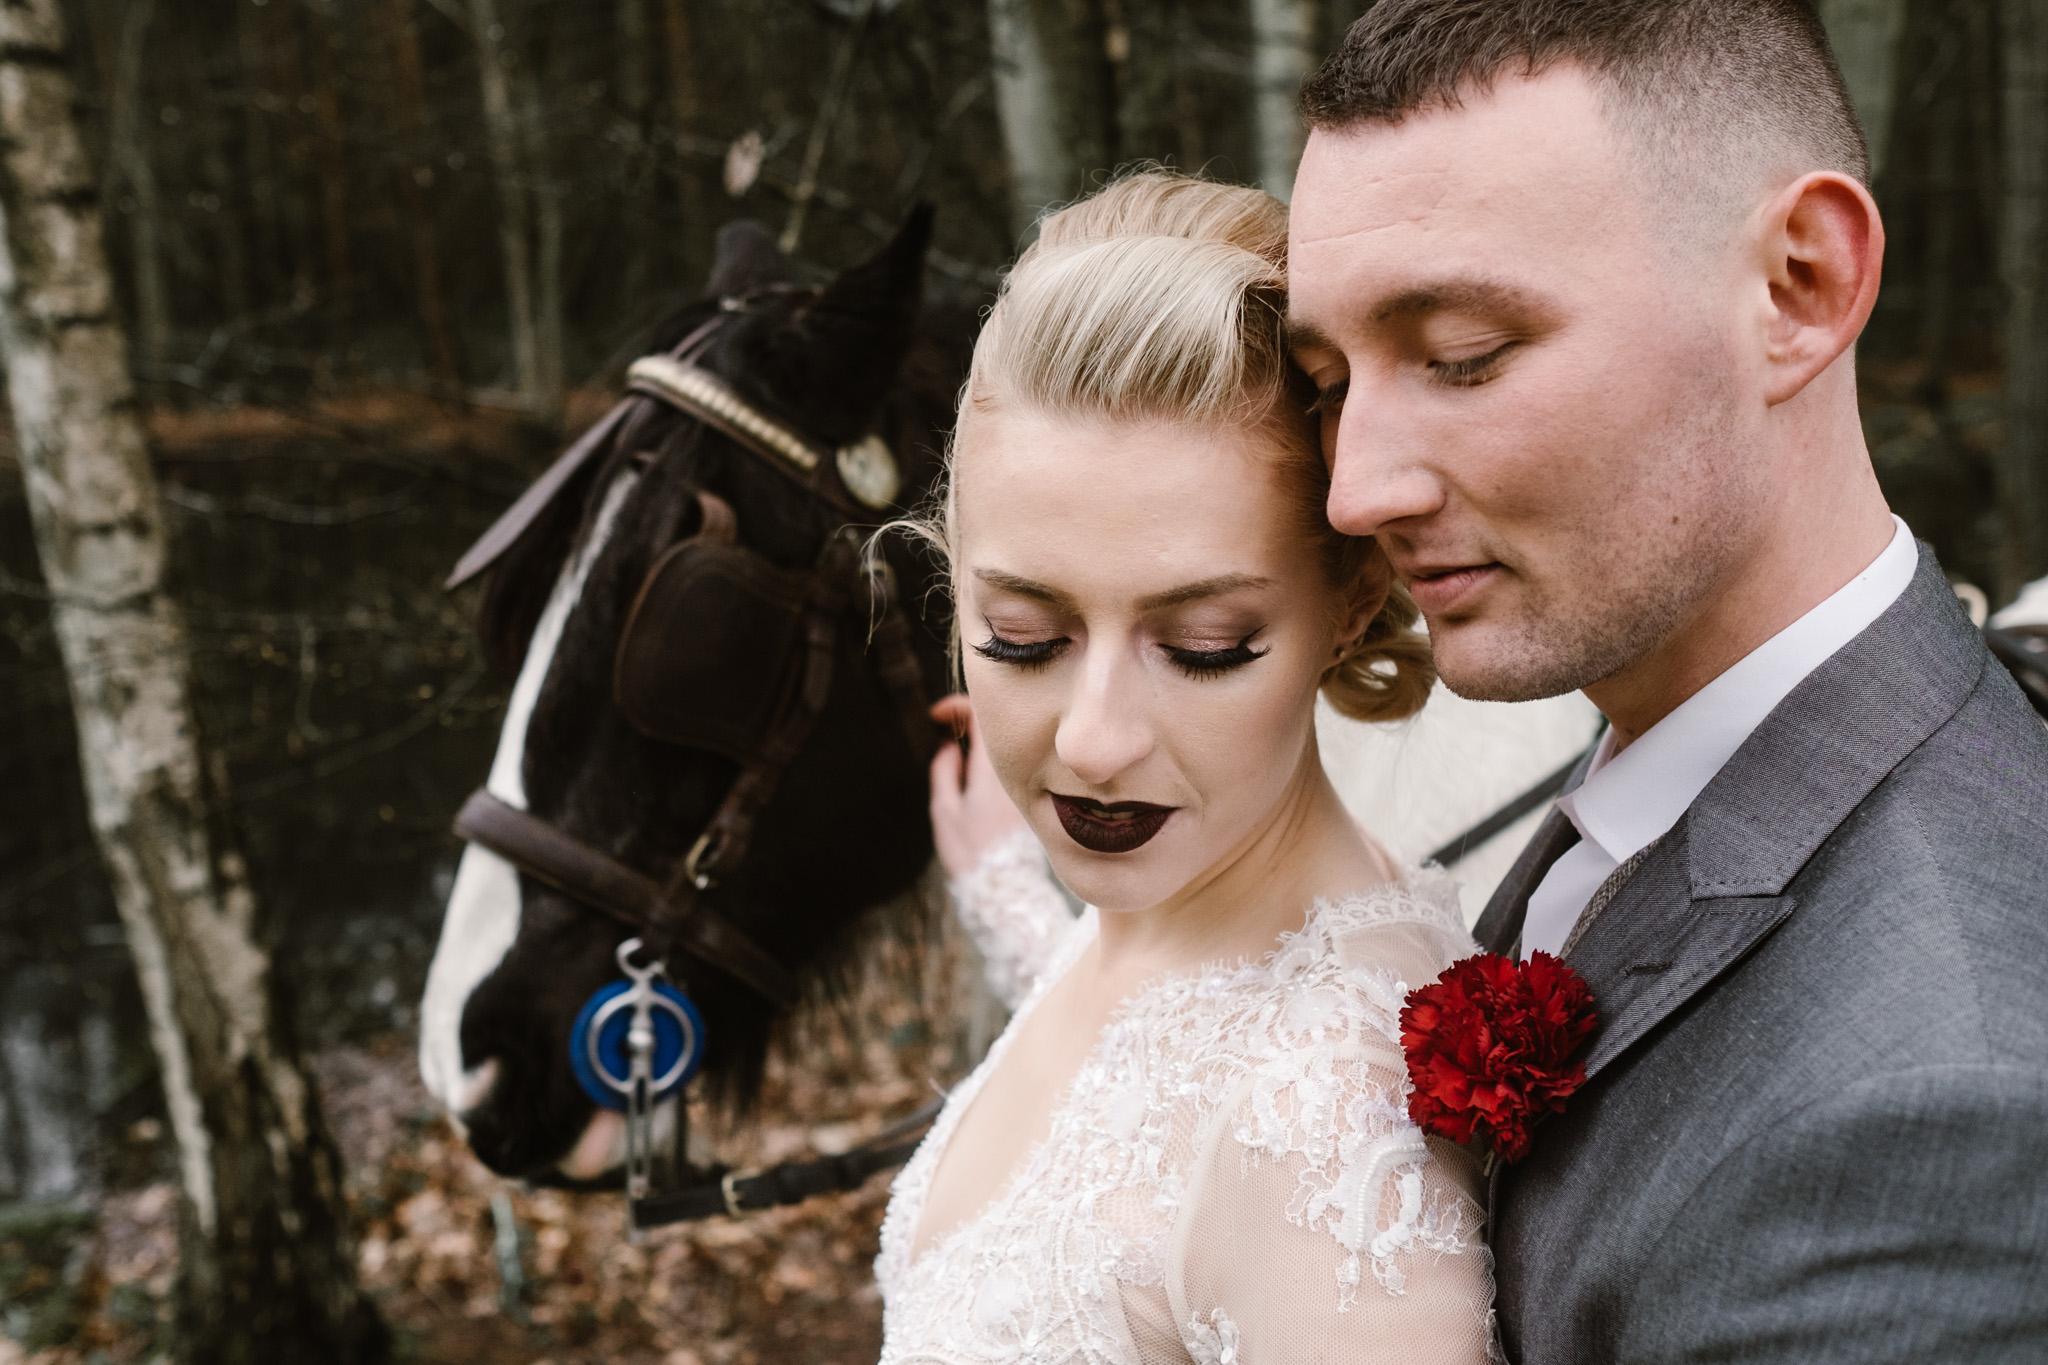 Captains-Wood-Barn-Alterative-Rustic-Vintage-Essex-Wedding-Suffolk-Grace-Elizabeth-12.jpg